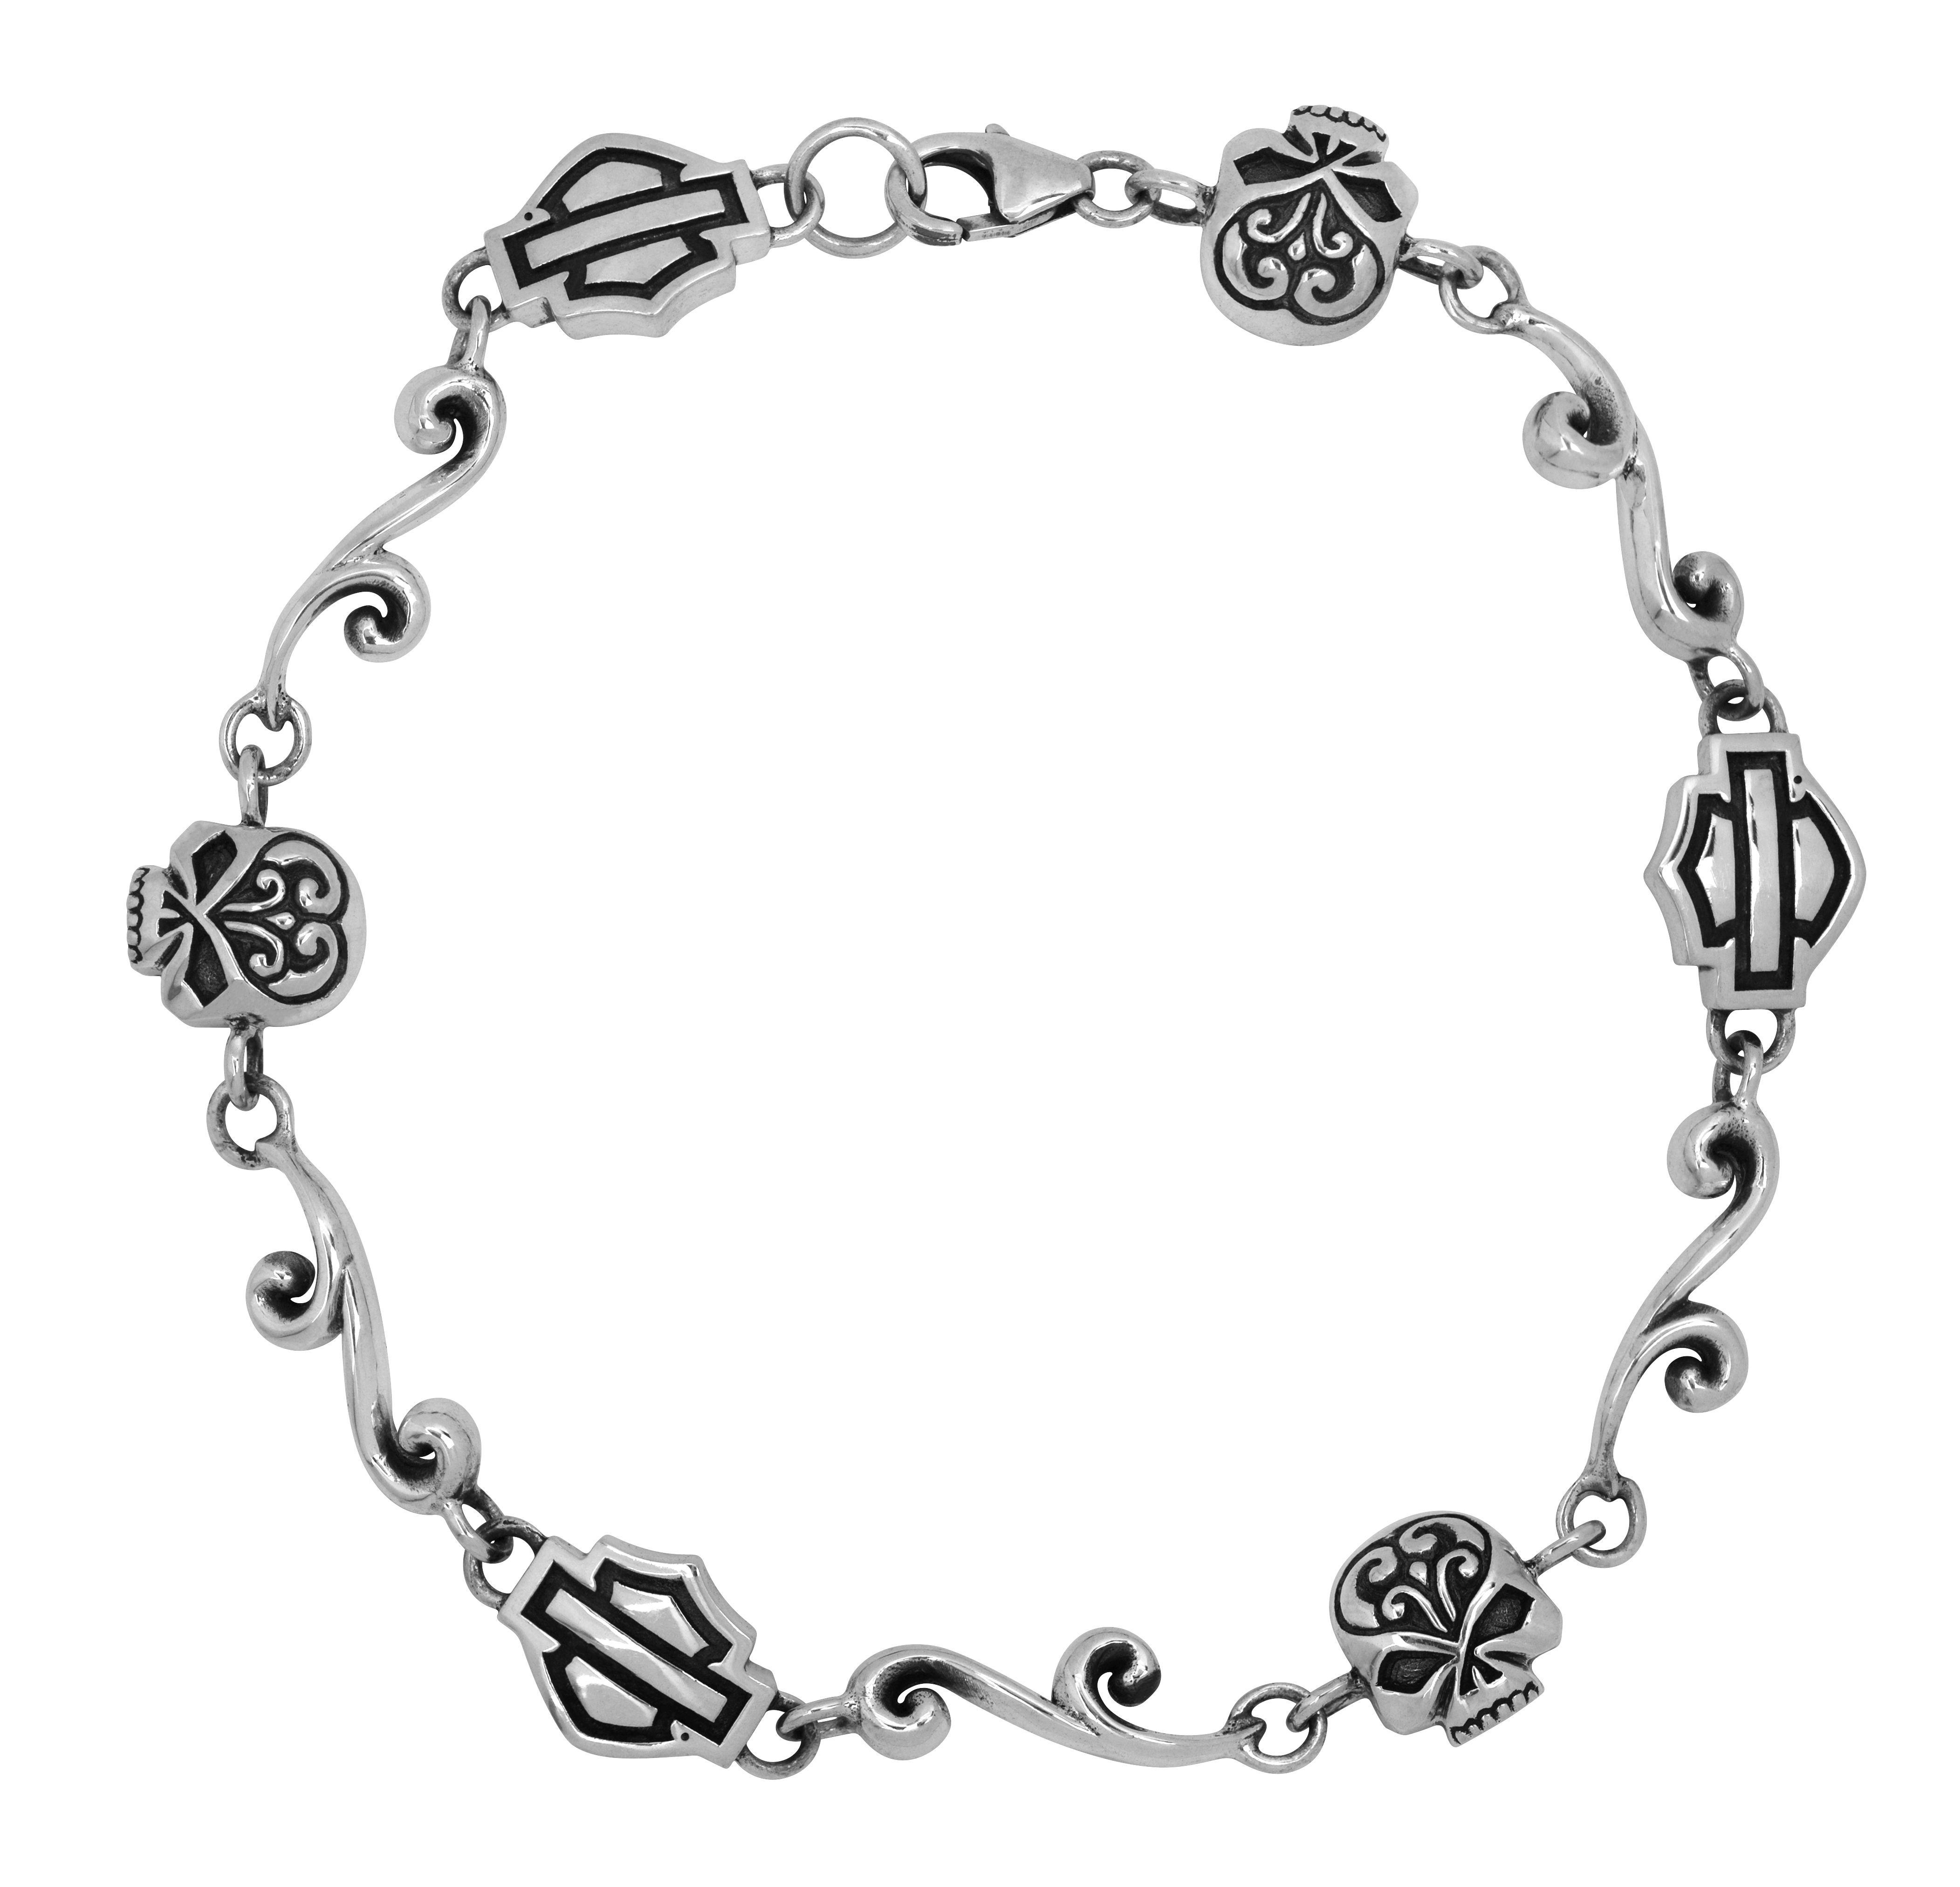 harley davidson wedding rings harley jewelry for women Harley Davidson Womens Silver Filigree Skull Chain